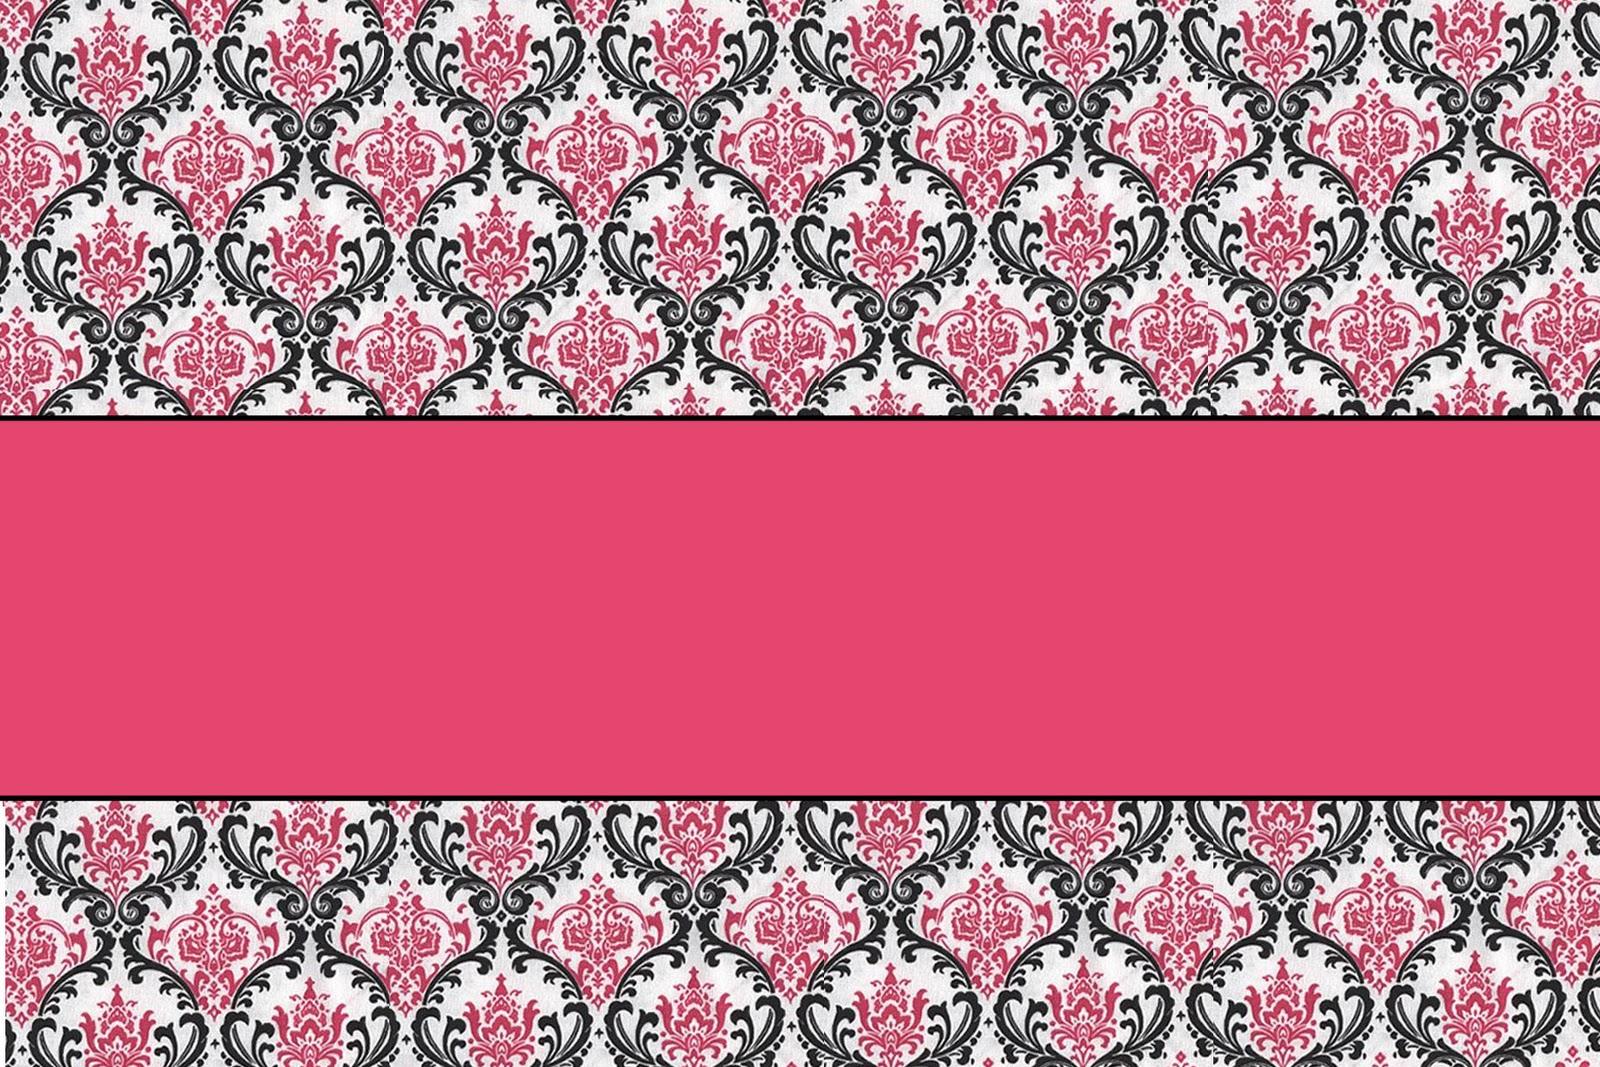 Pink Damask Wallpaper 9 High Resolution